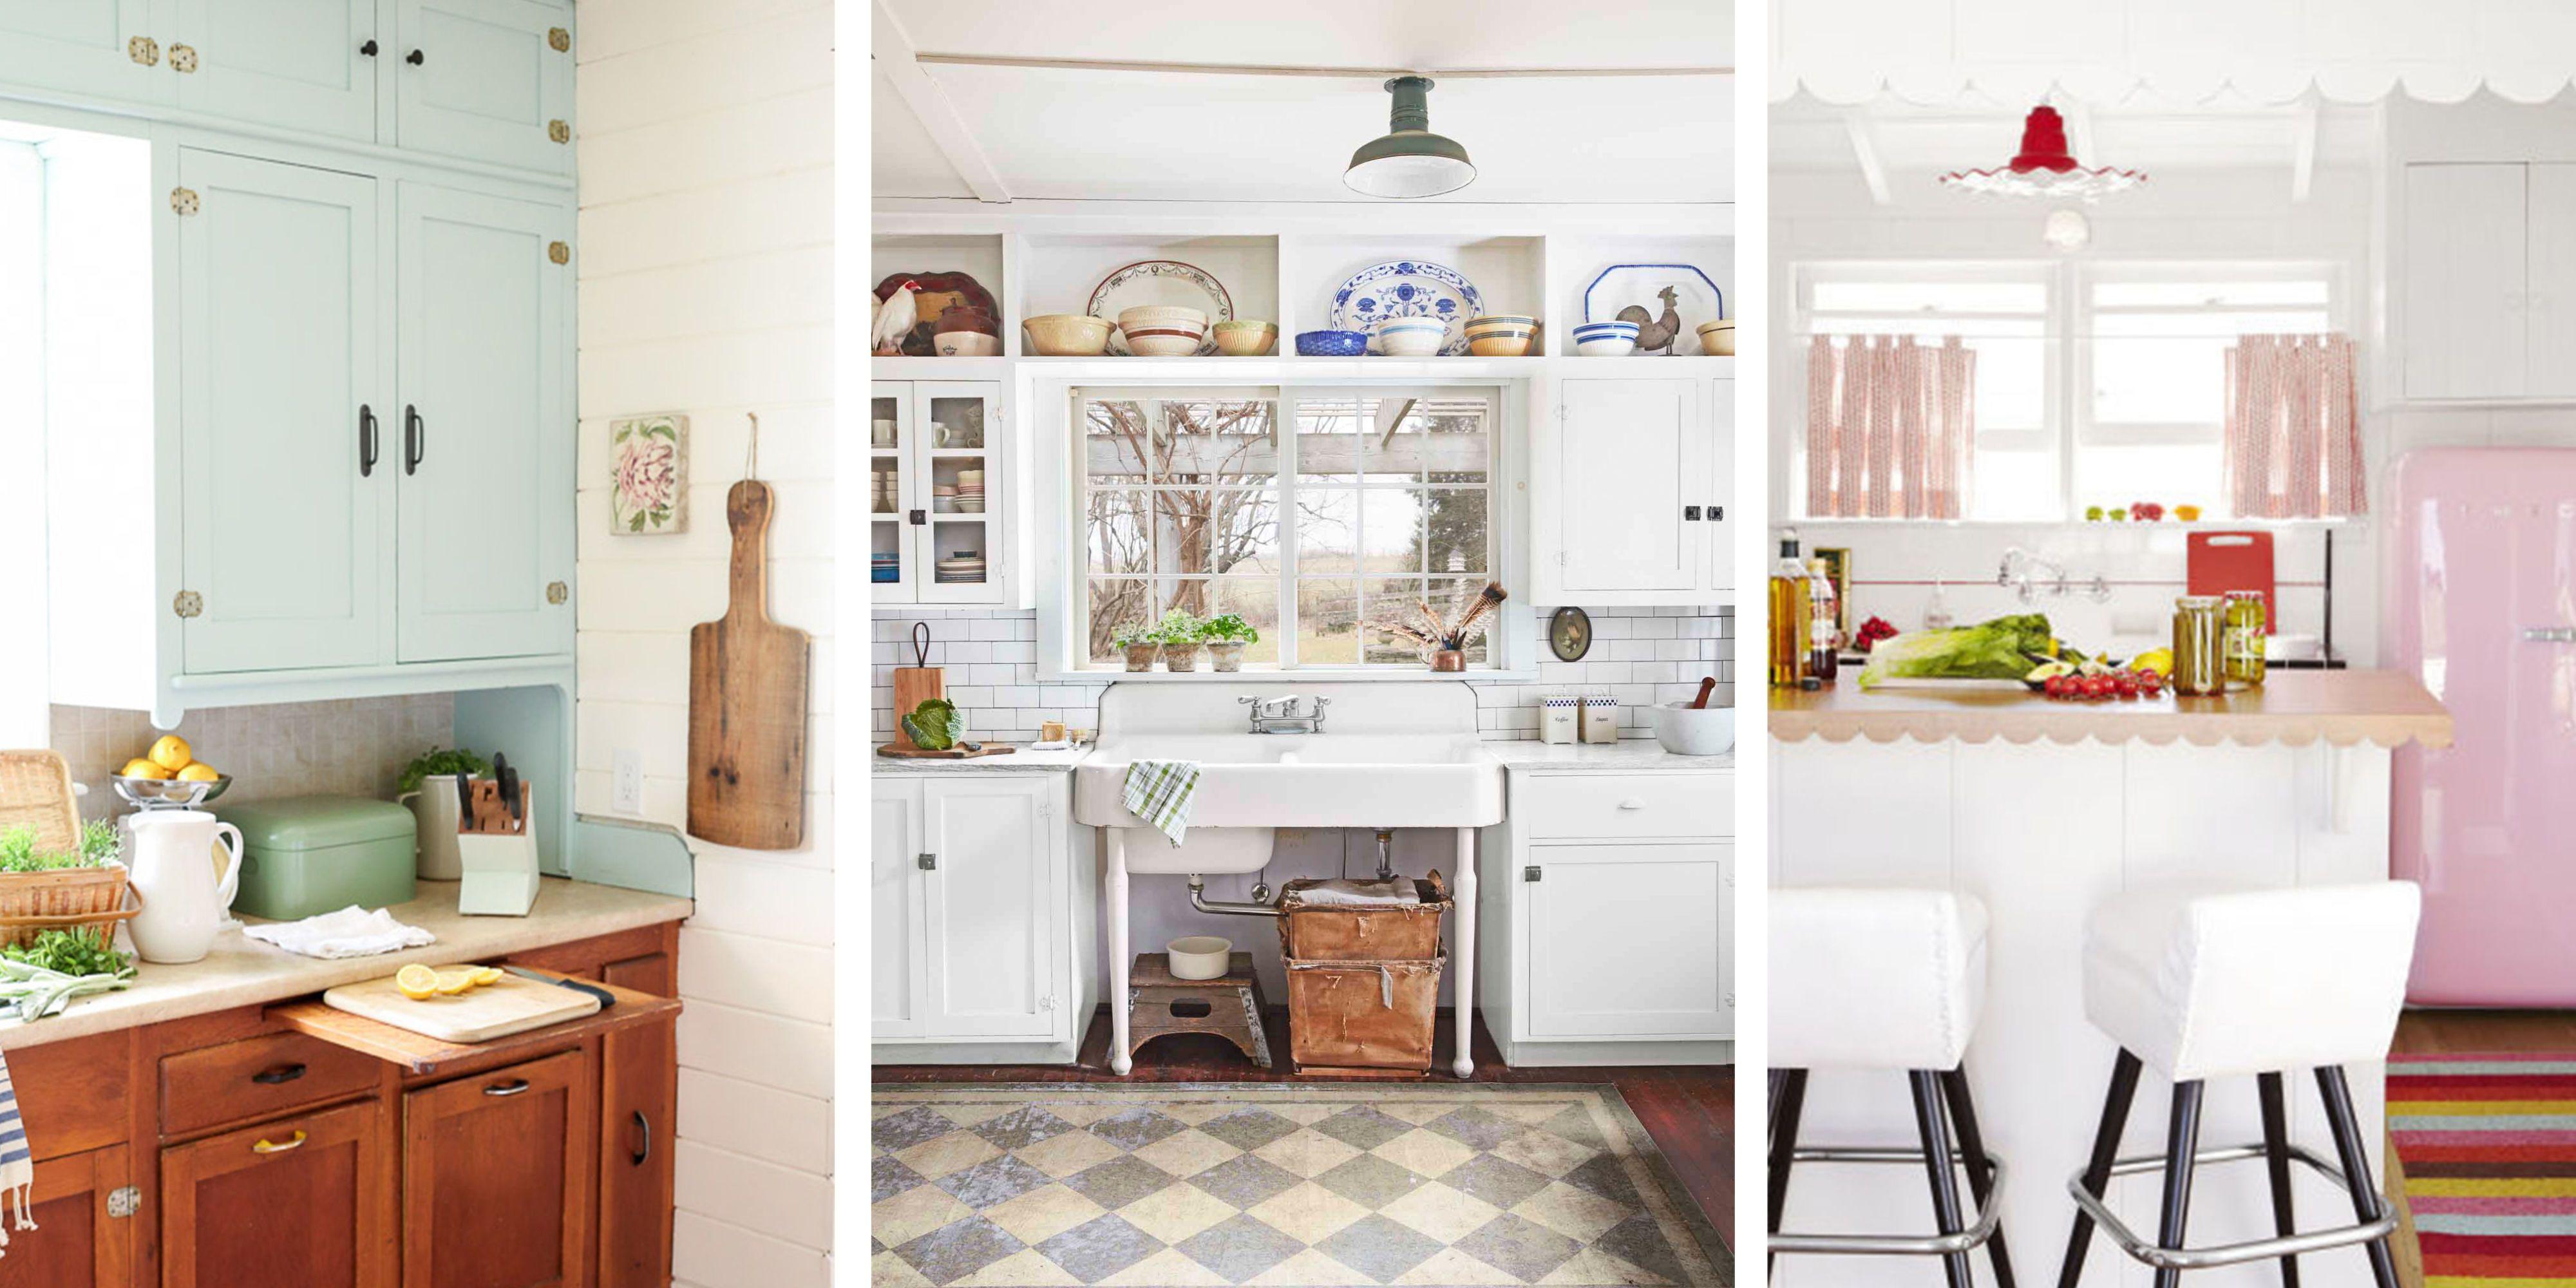 20 Vintage Kitchen Decorating Ideas Design Inspiration